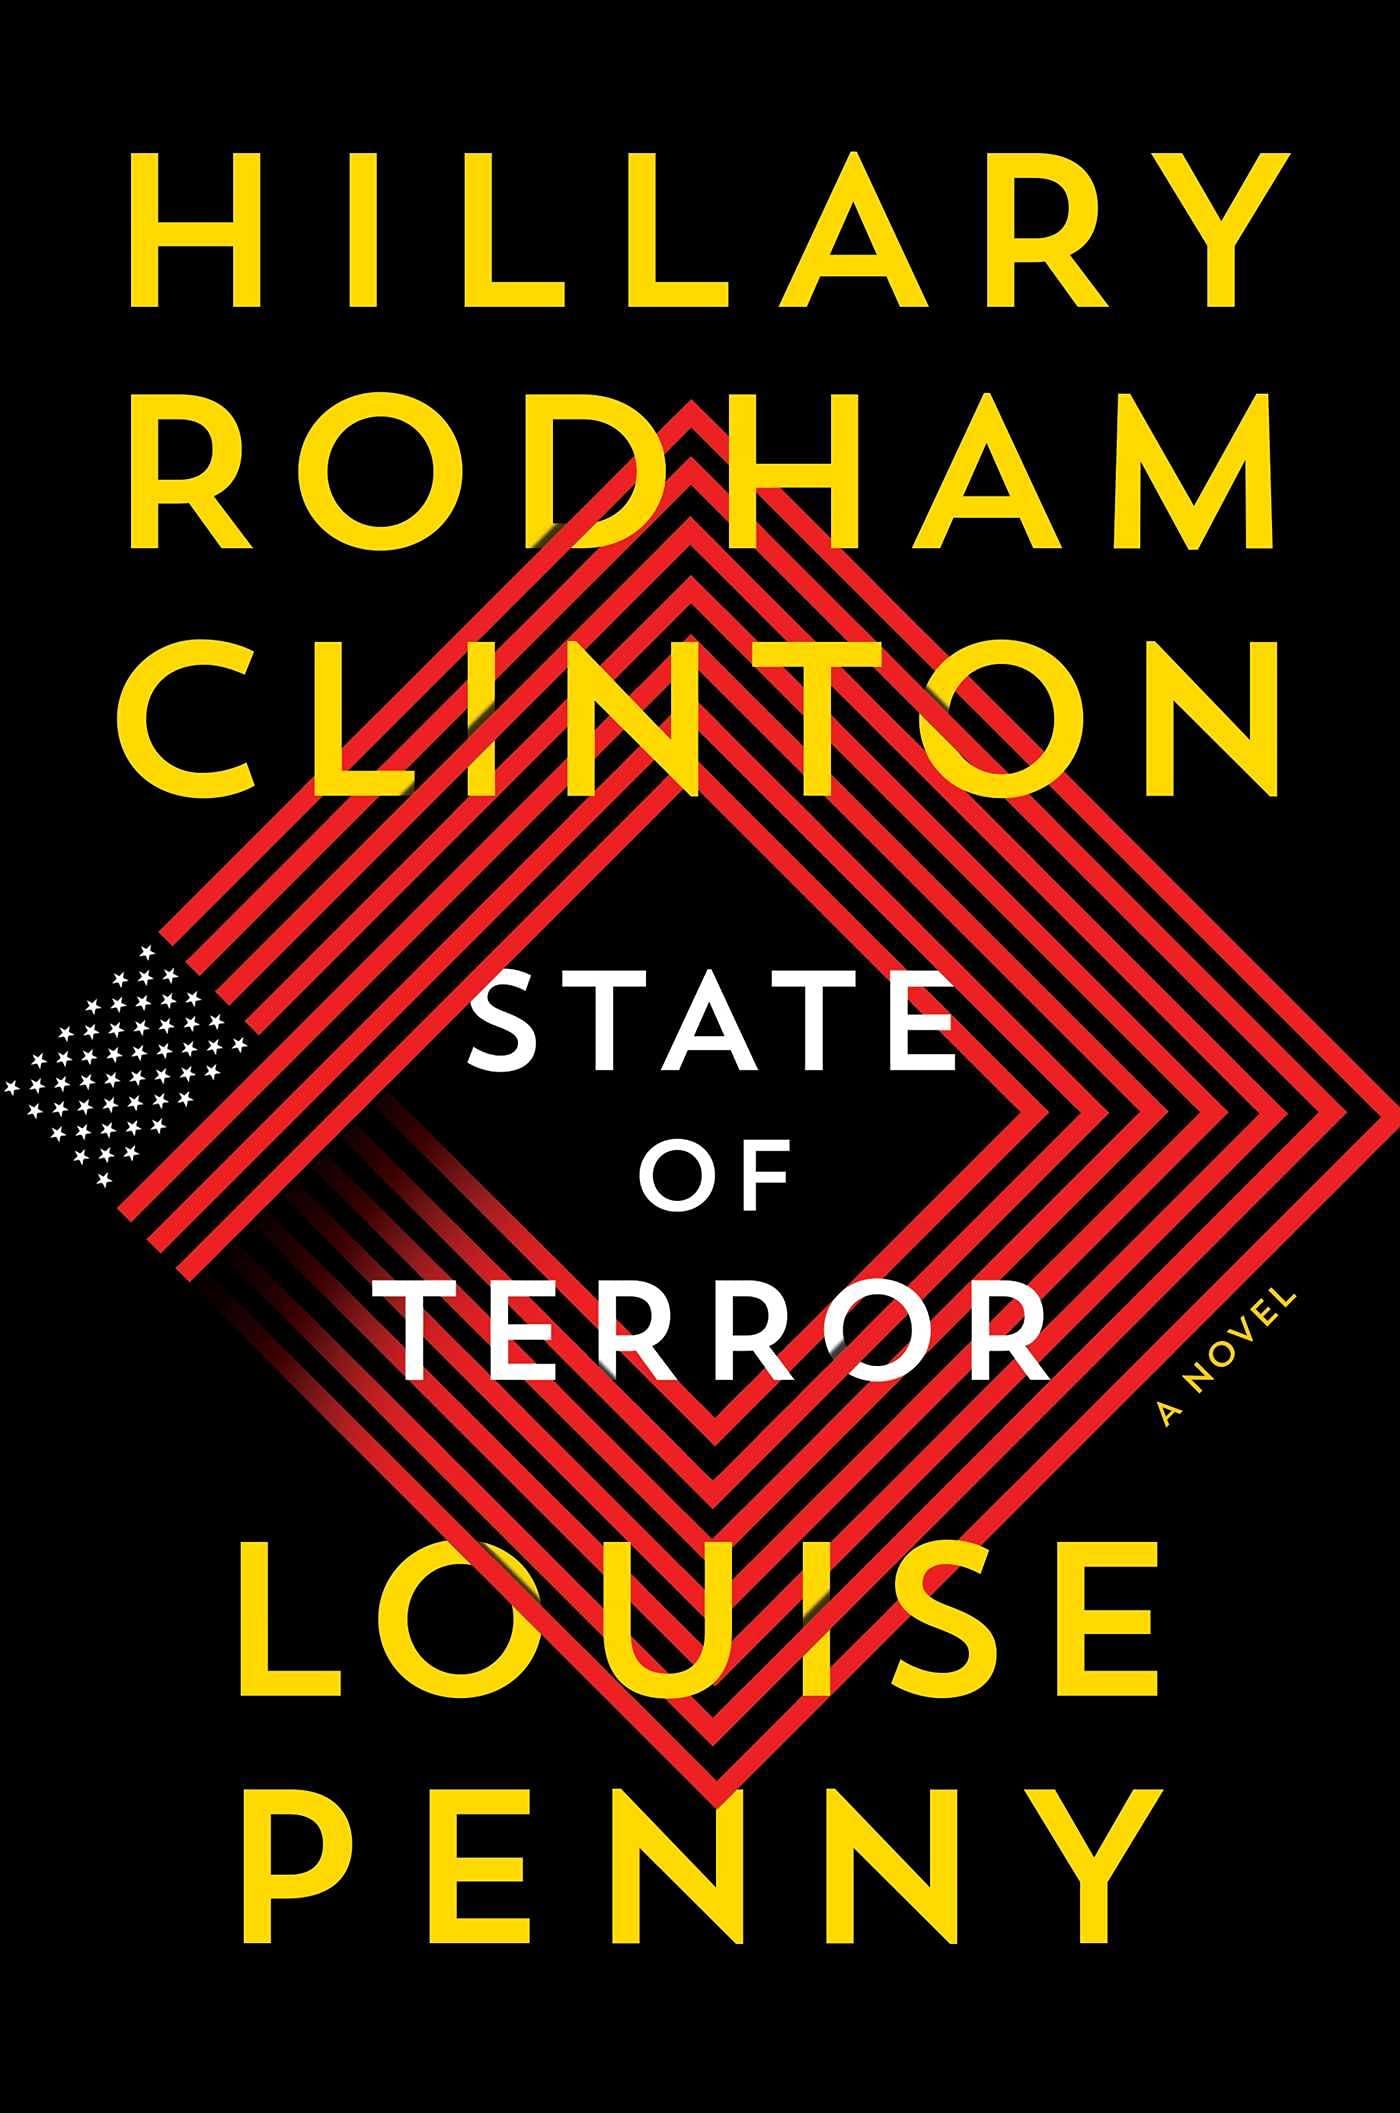 State of Terror: A Novel: Penny, Louise, Clinton, Hillary Rodham:  9781982173678: Books - Amazon.ca